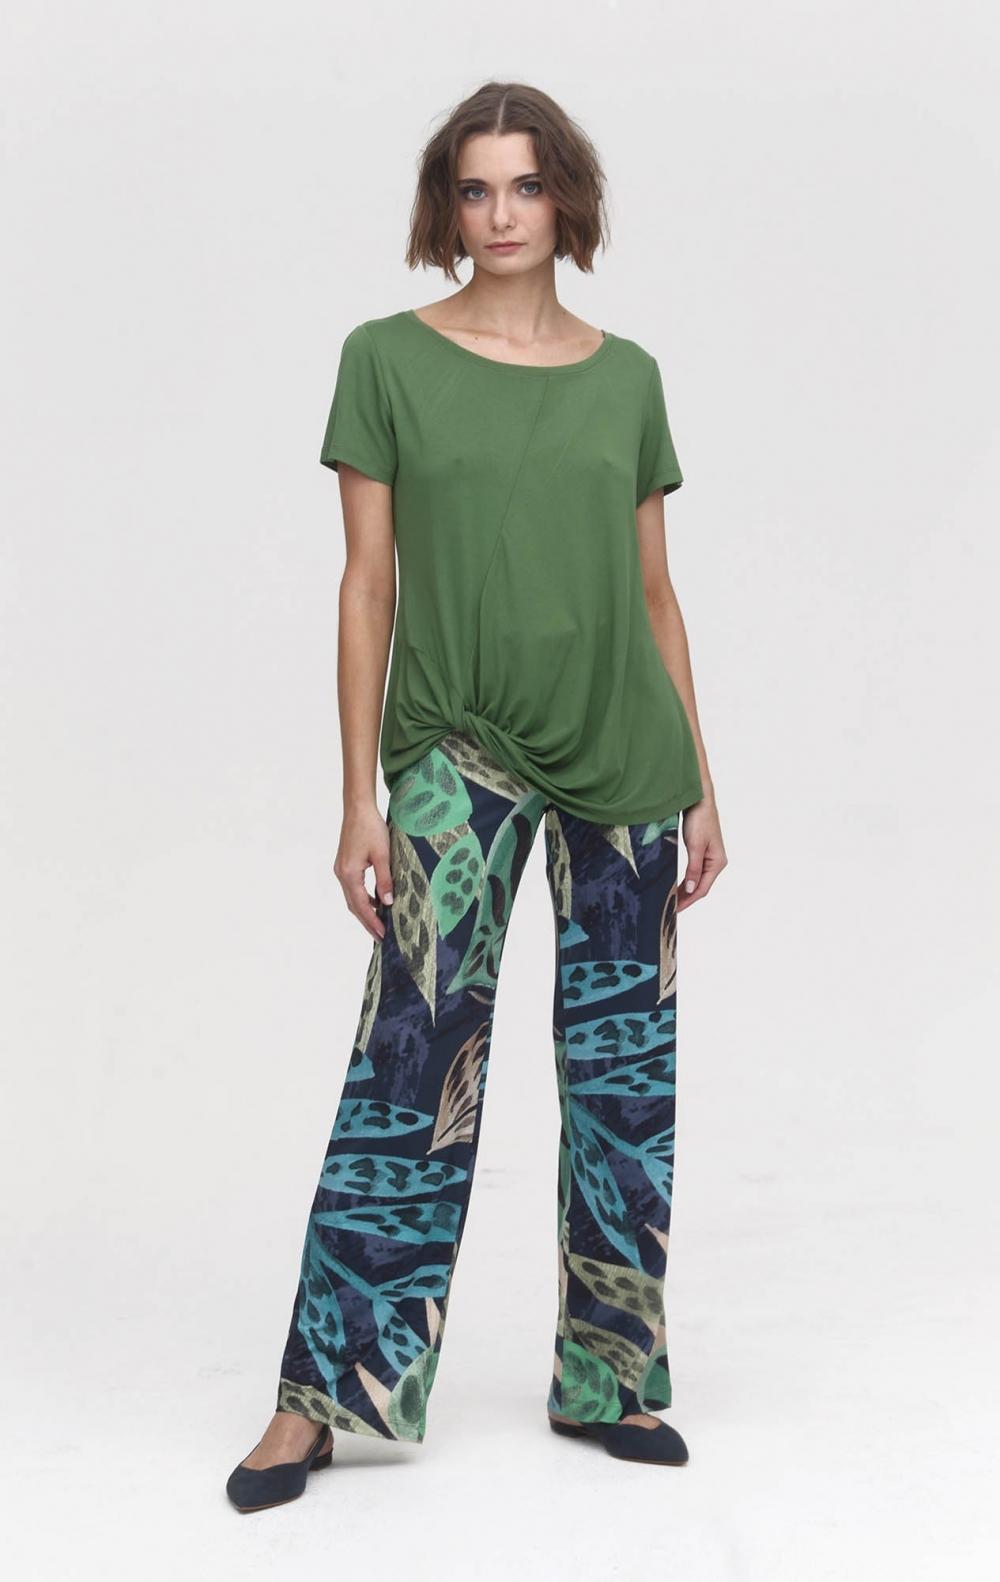 Camiseta Visco Helena Verde  - Foto 1